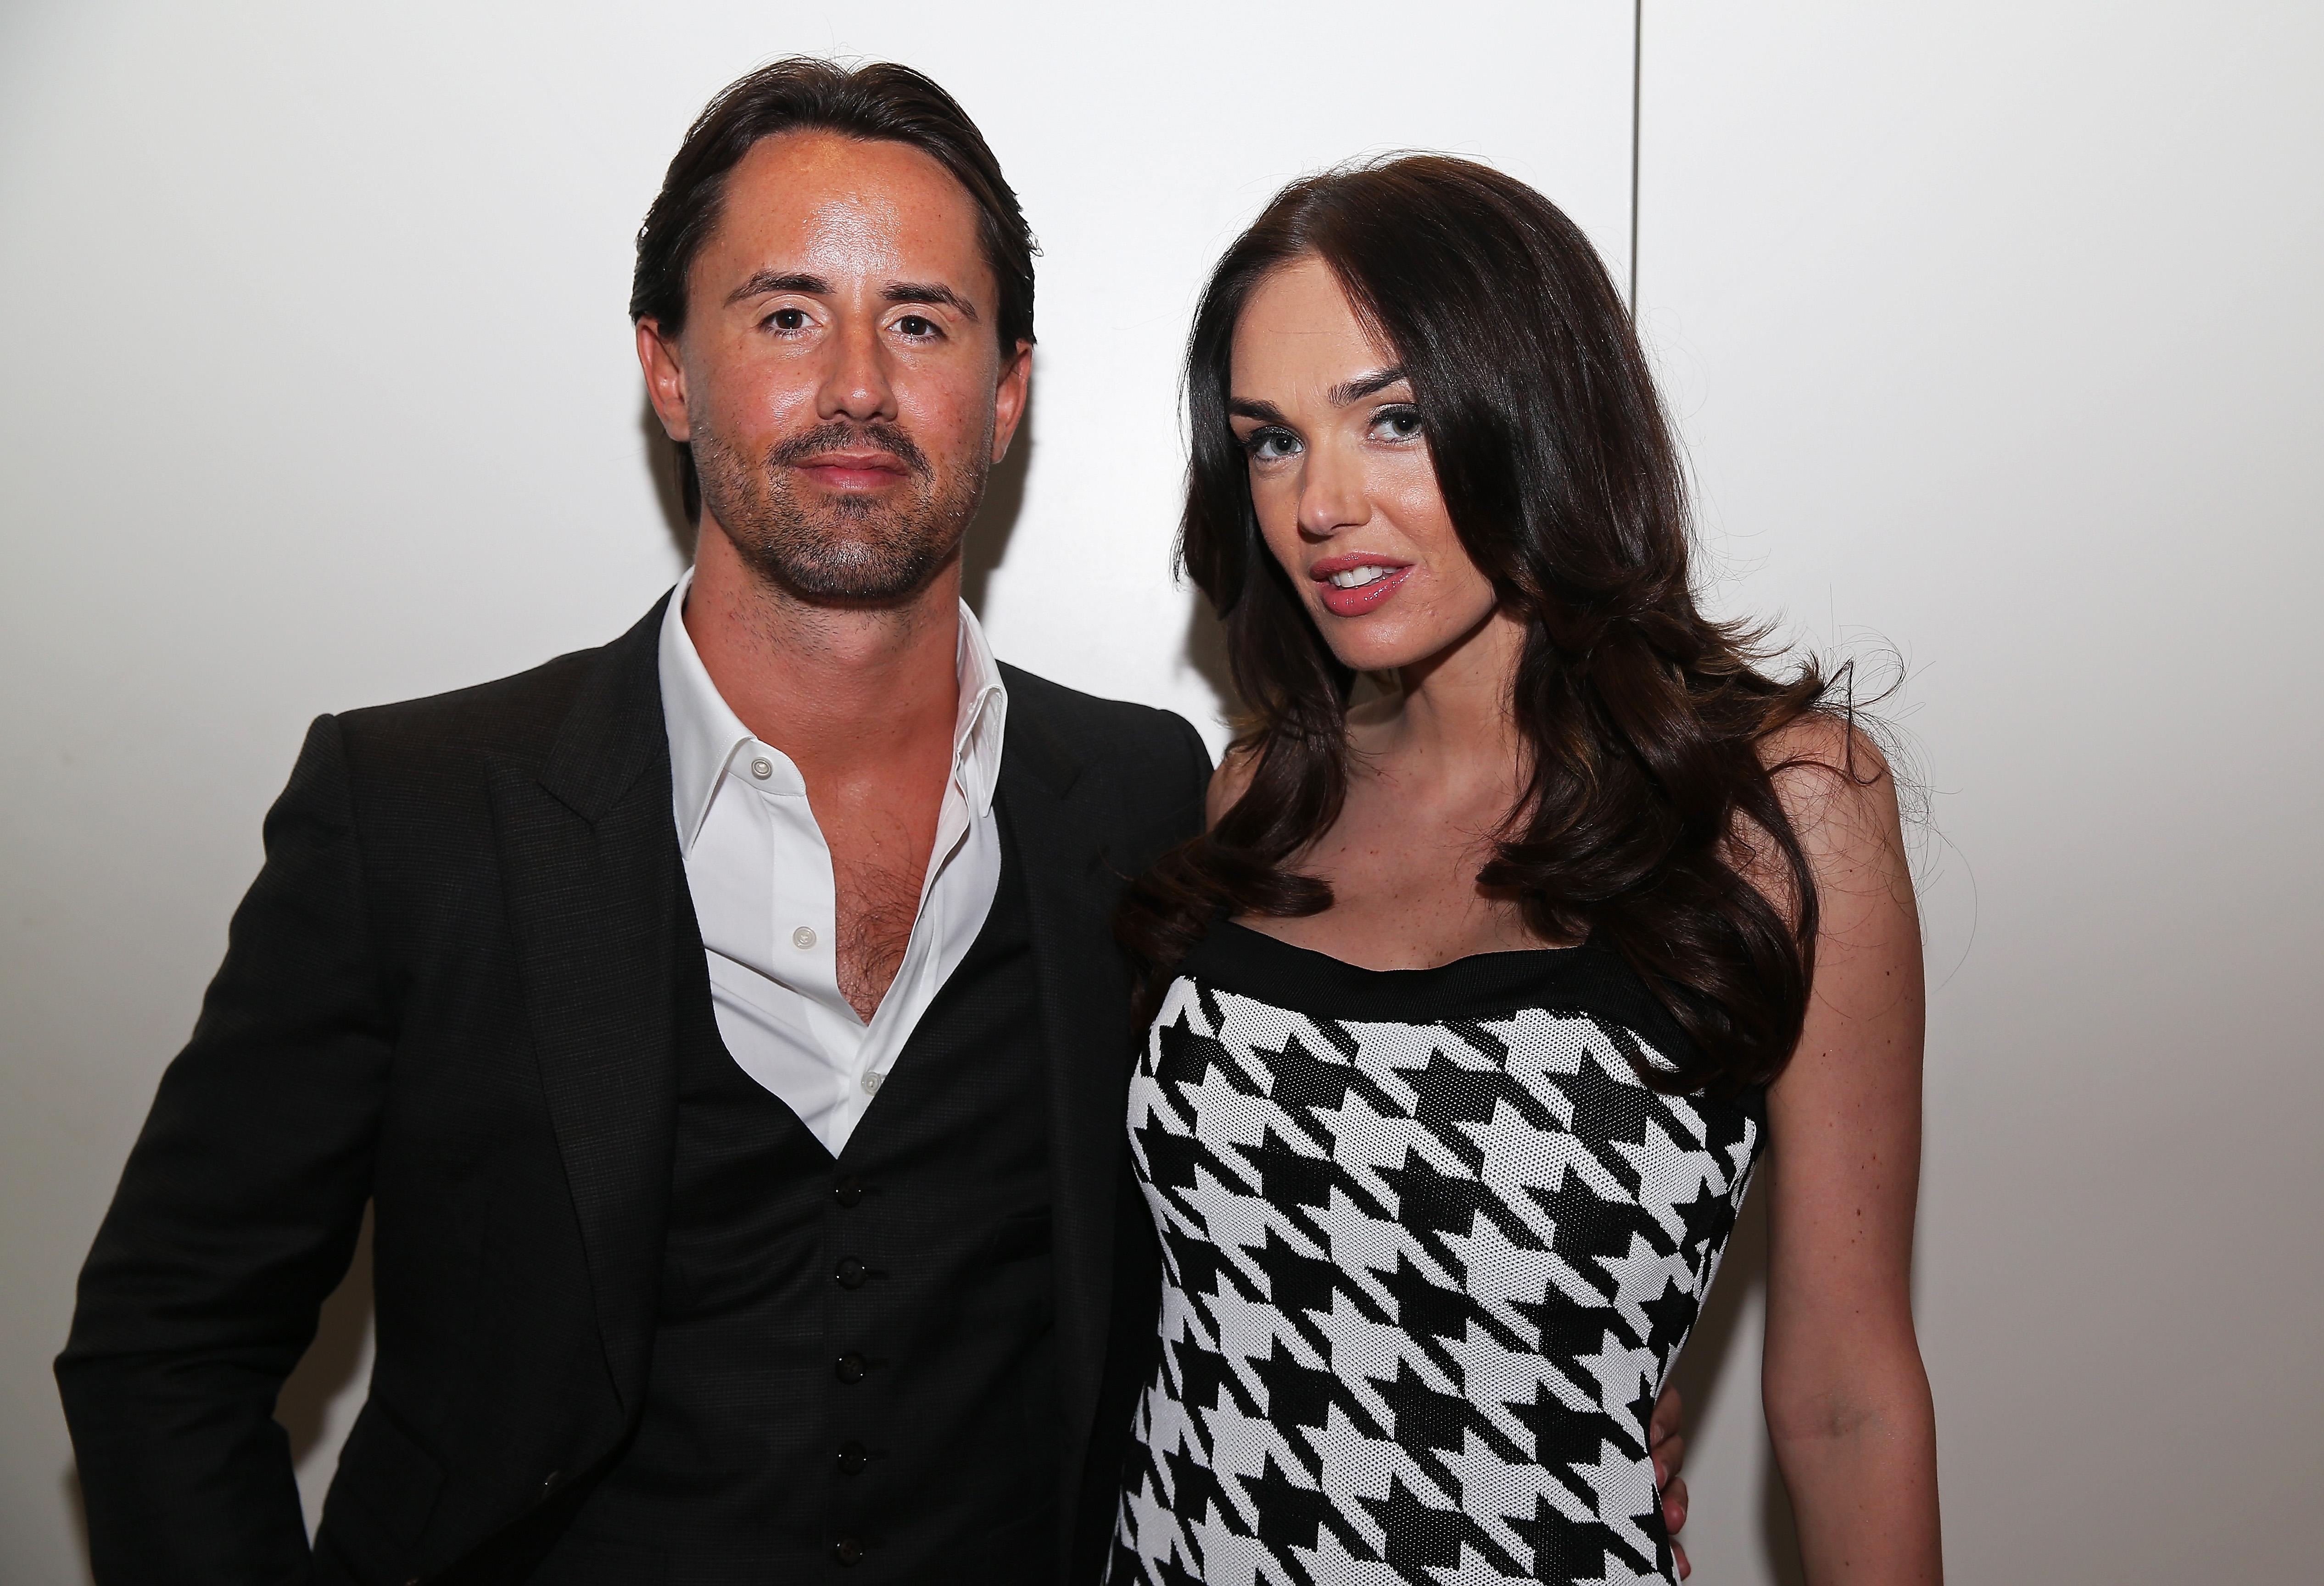 Is Tamara Ecclestone's marriage to Jay Rutland over?